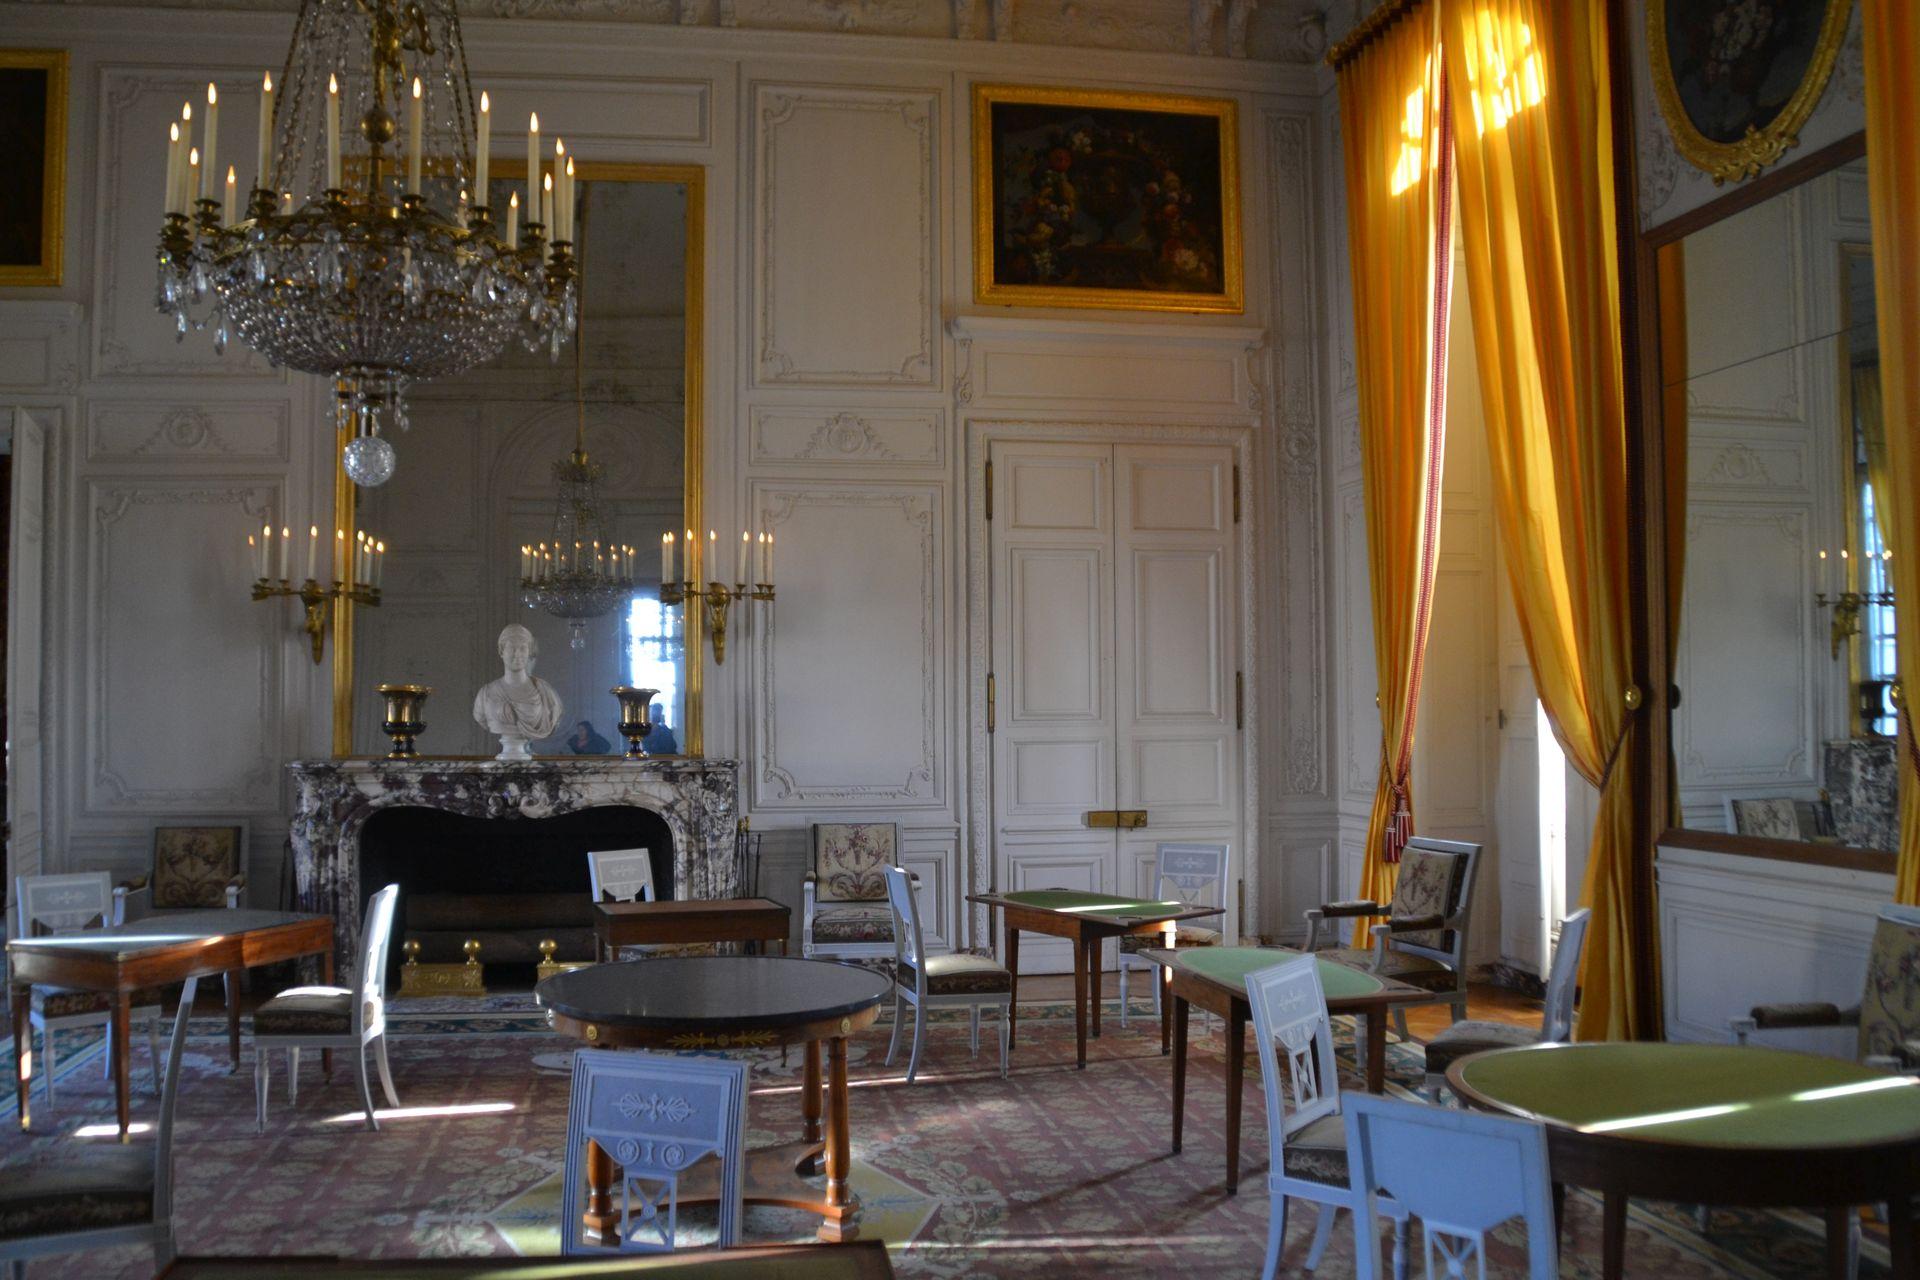 Versailles-i kastély nagy-trianon